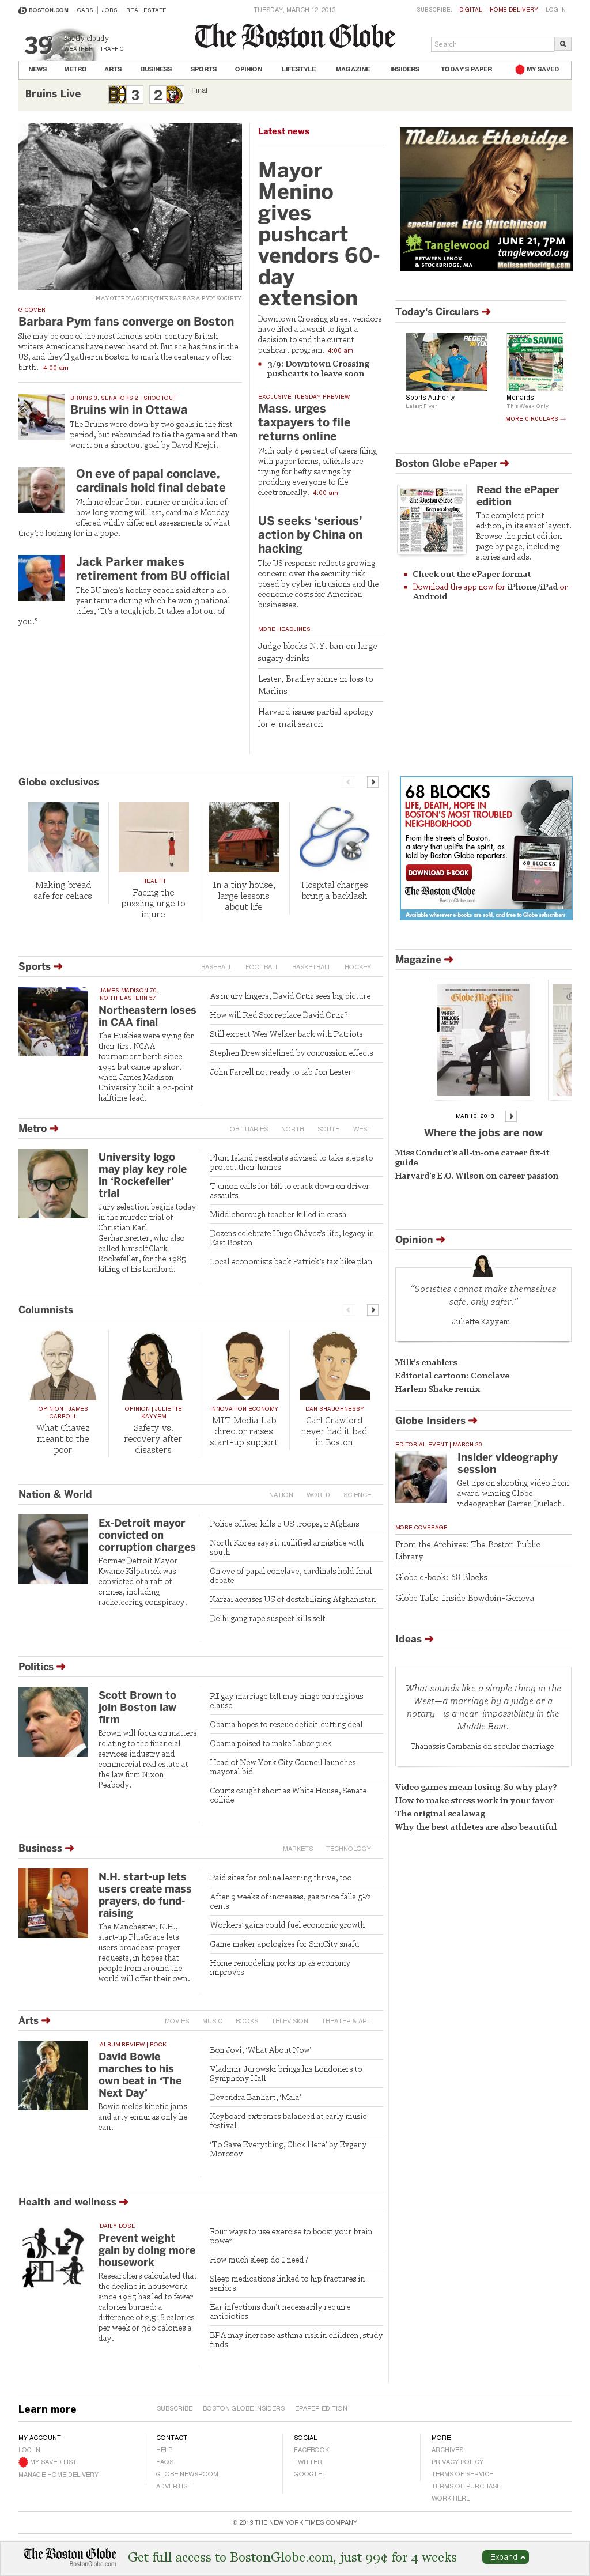 The Boston Globe at Tuesday March 12, 2013, 6:02 a.m. UTC